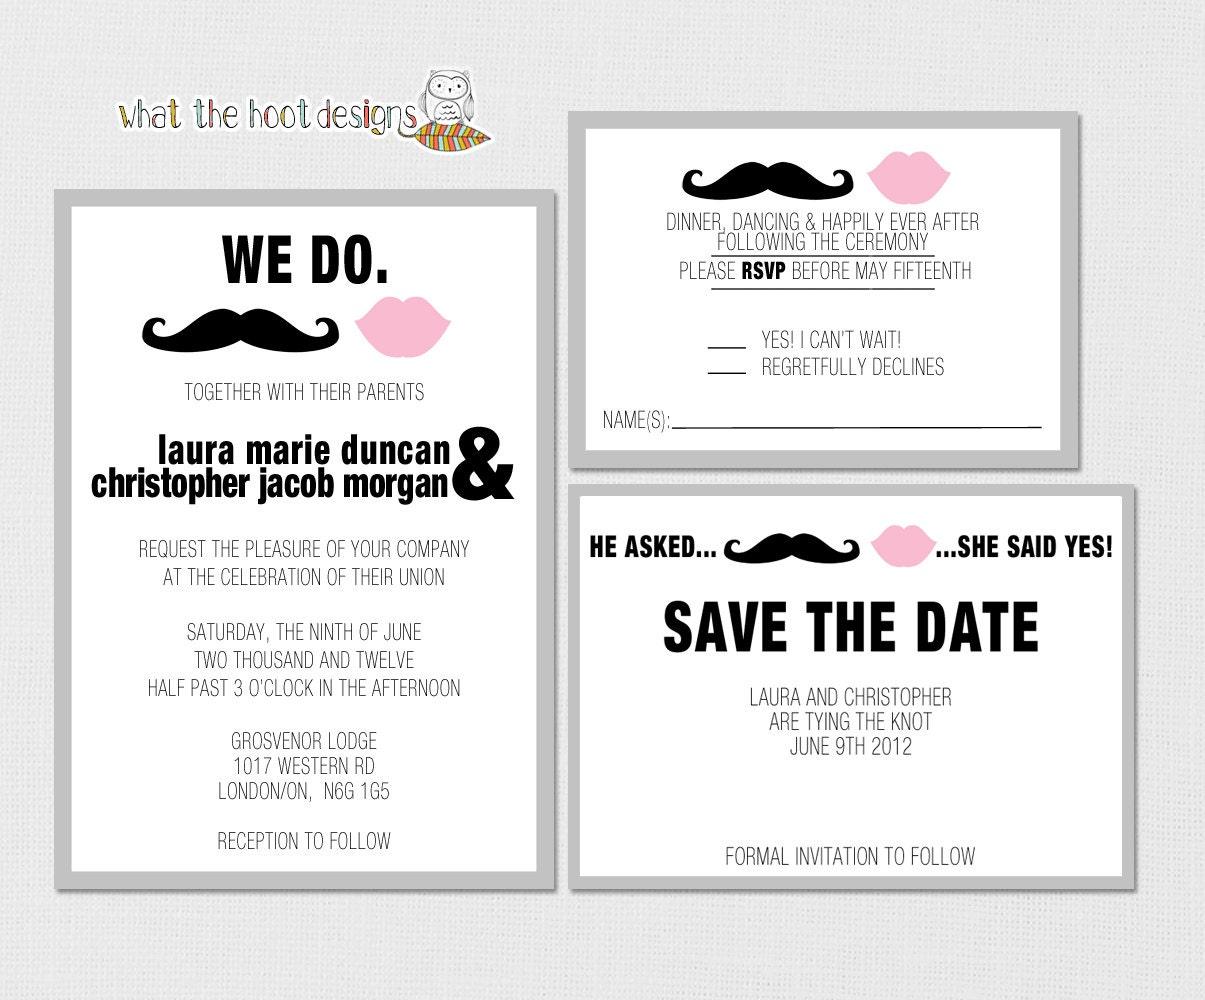 Responding To A Wedding Invitation: Printable/DIY Wedding Invitation Response Card And Save The